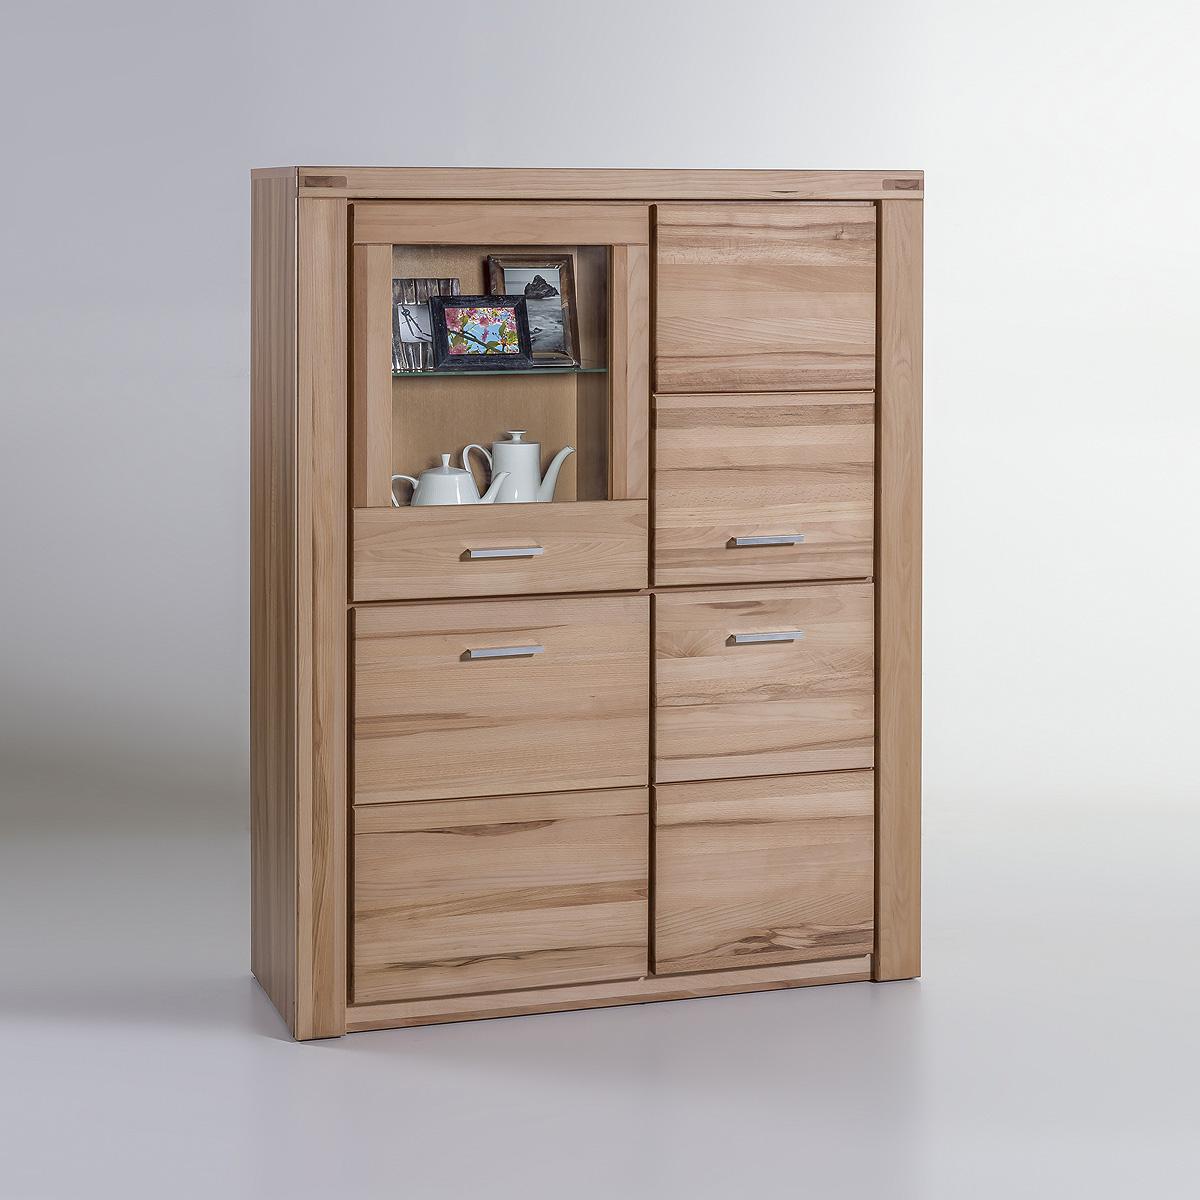 vitrine tabea standvitrine buffet highboard kernbuche oder wildeiche teil massiv ebay. Black Bedroom Furniture Sets. Home Design Ideas